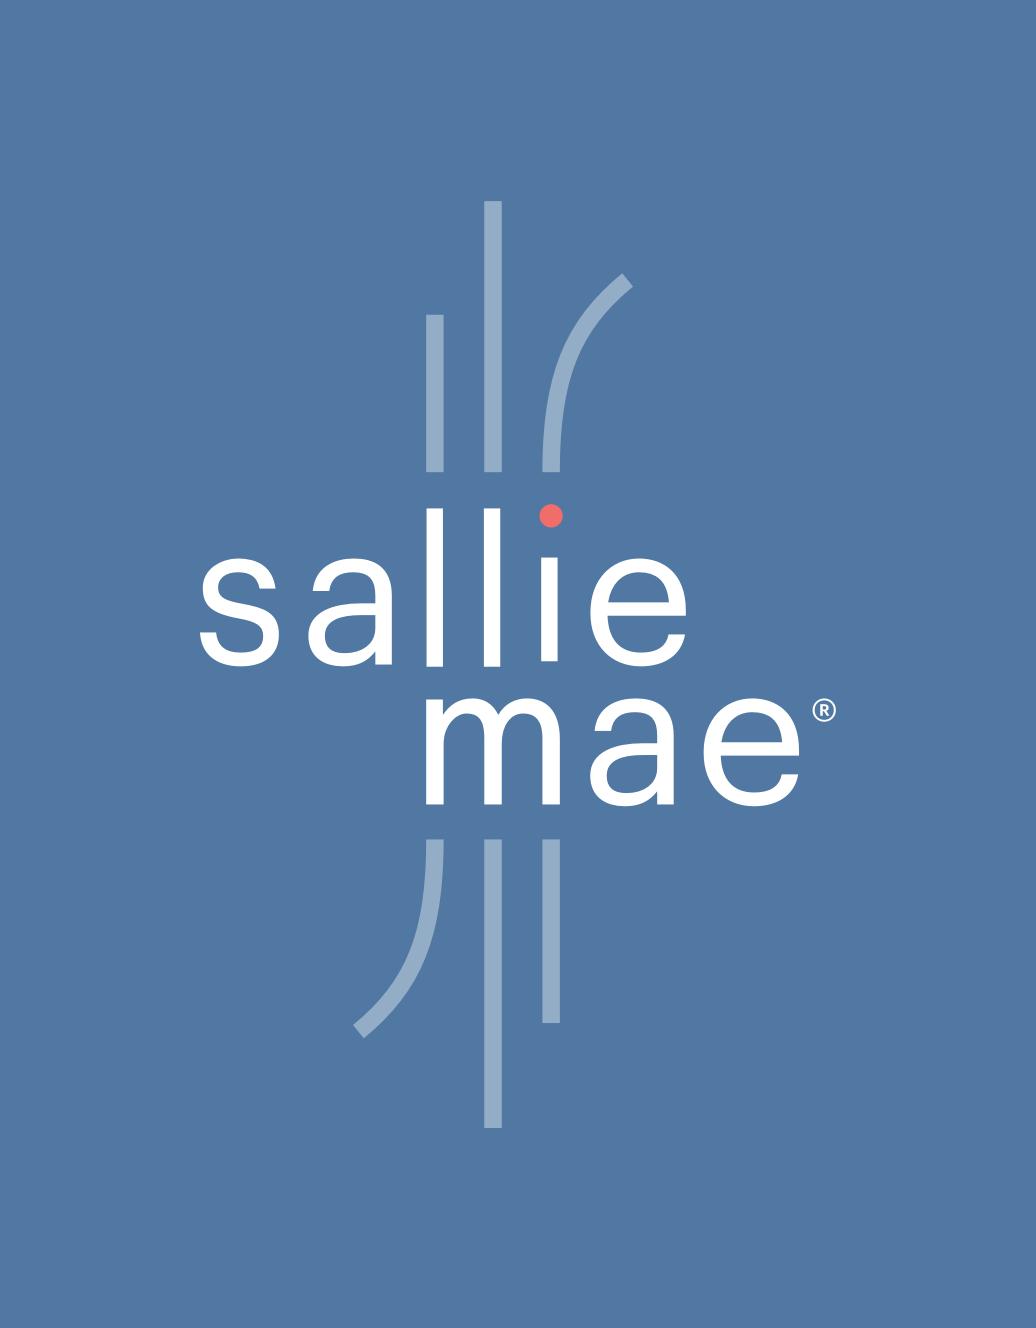 New Logo for Sallie Mae